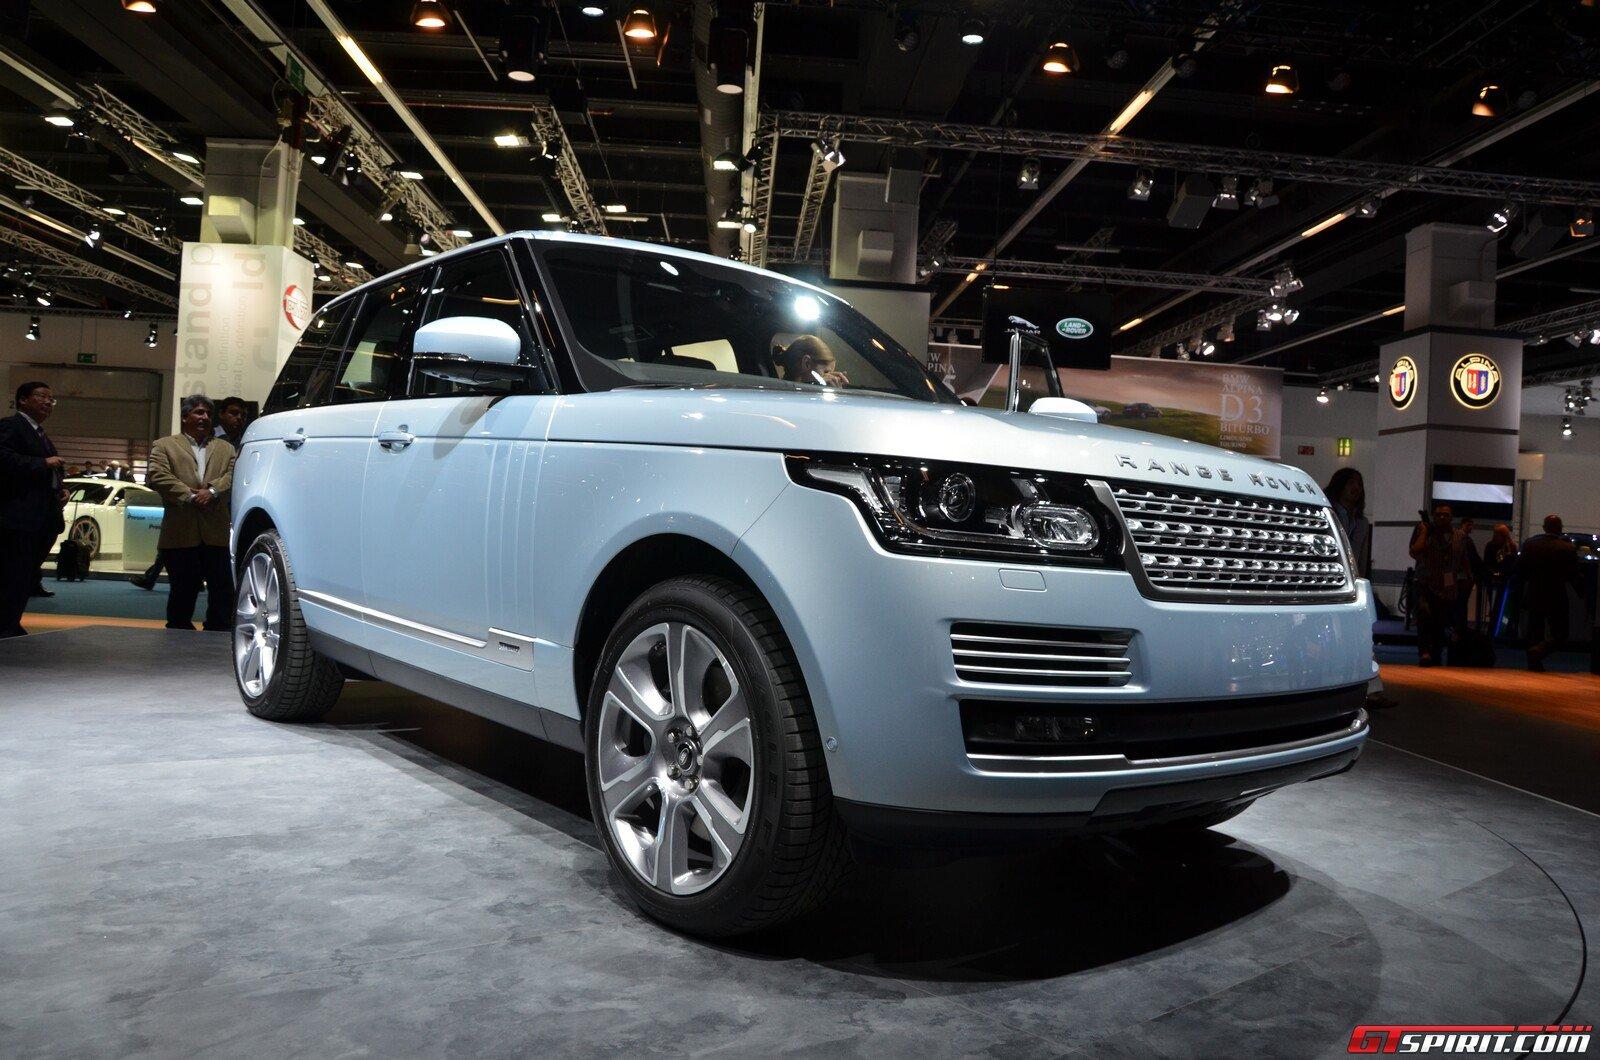 frankfurt 2013 range rover hybrid gtspirit. Black Bedroom Furniture Sets. Home Design Ideas